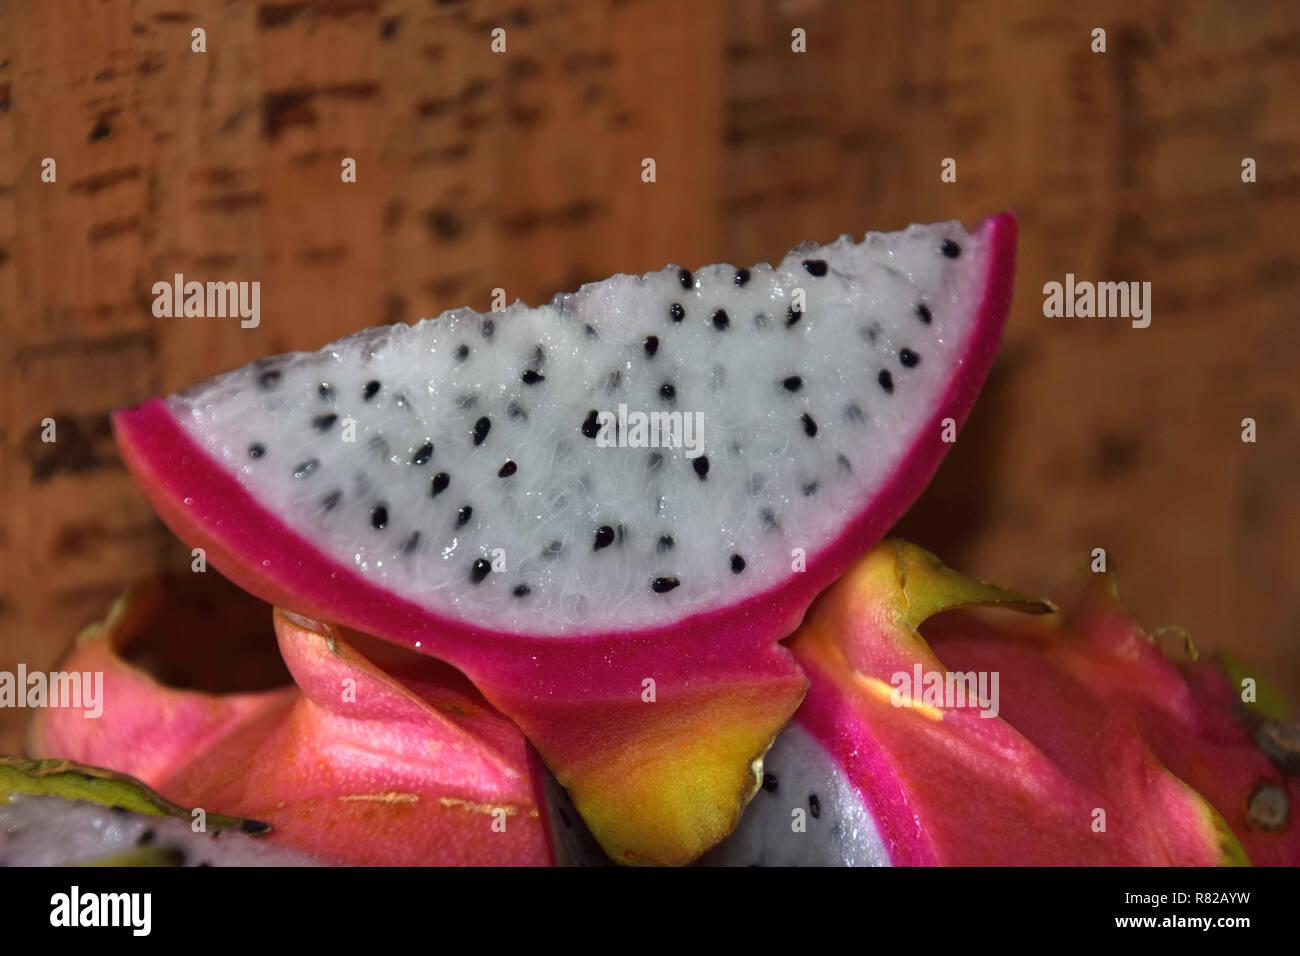 macro shot of slice of dragon fruit in front of cork background , pitaya blanca or white-fleshed and pink-skinned ripe pitahaya fruit also called hylo - Stock Image